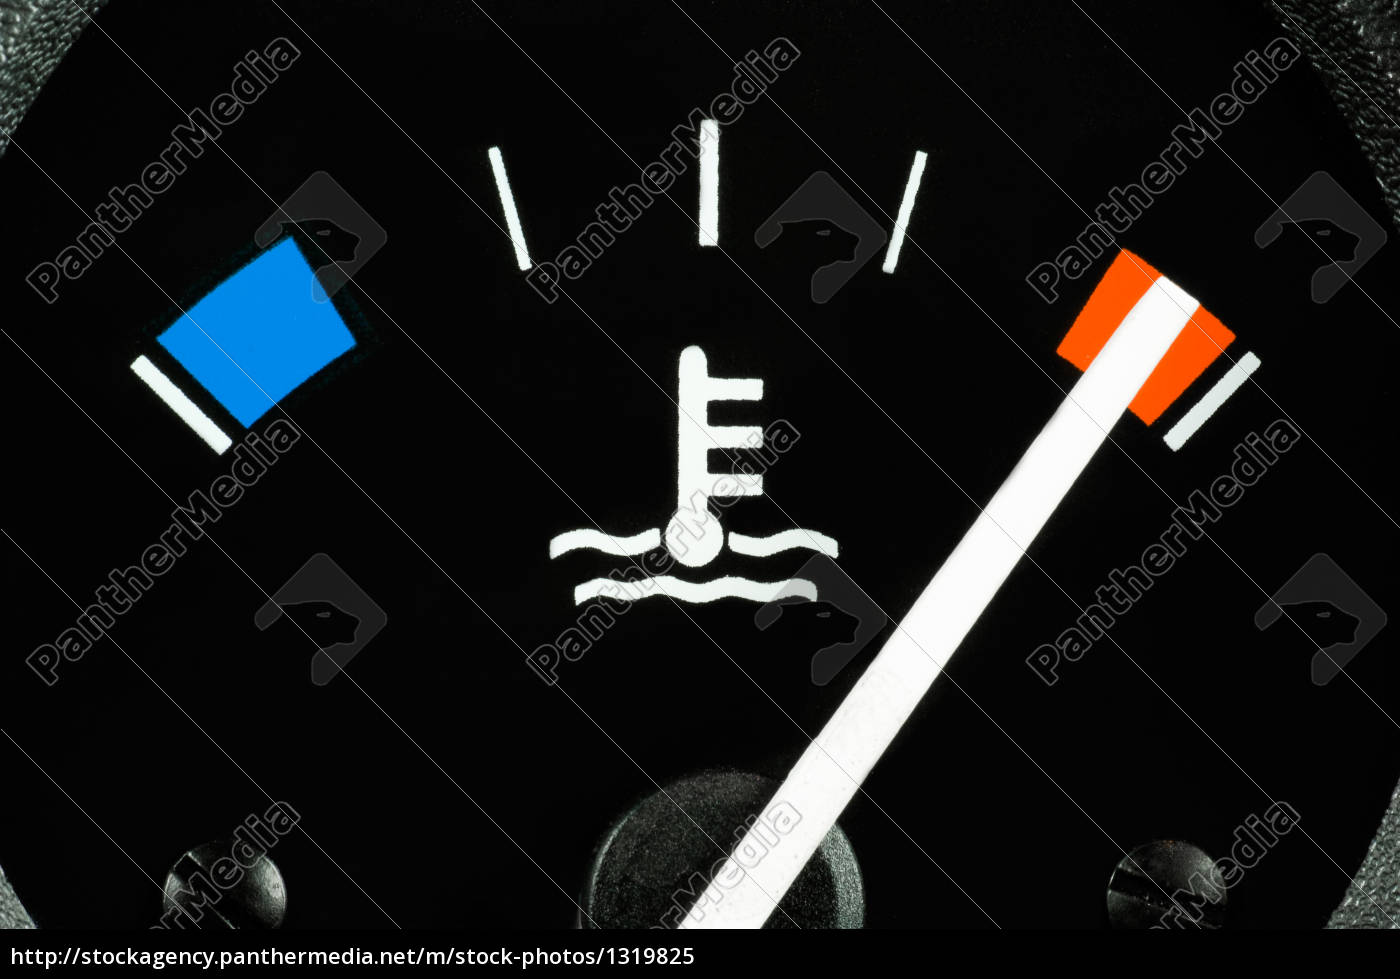 cooling, water, temperature, indicator, hot - 1319825